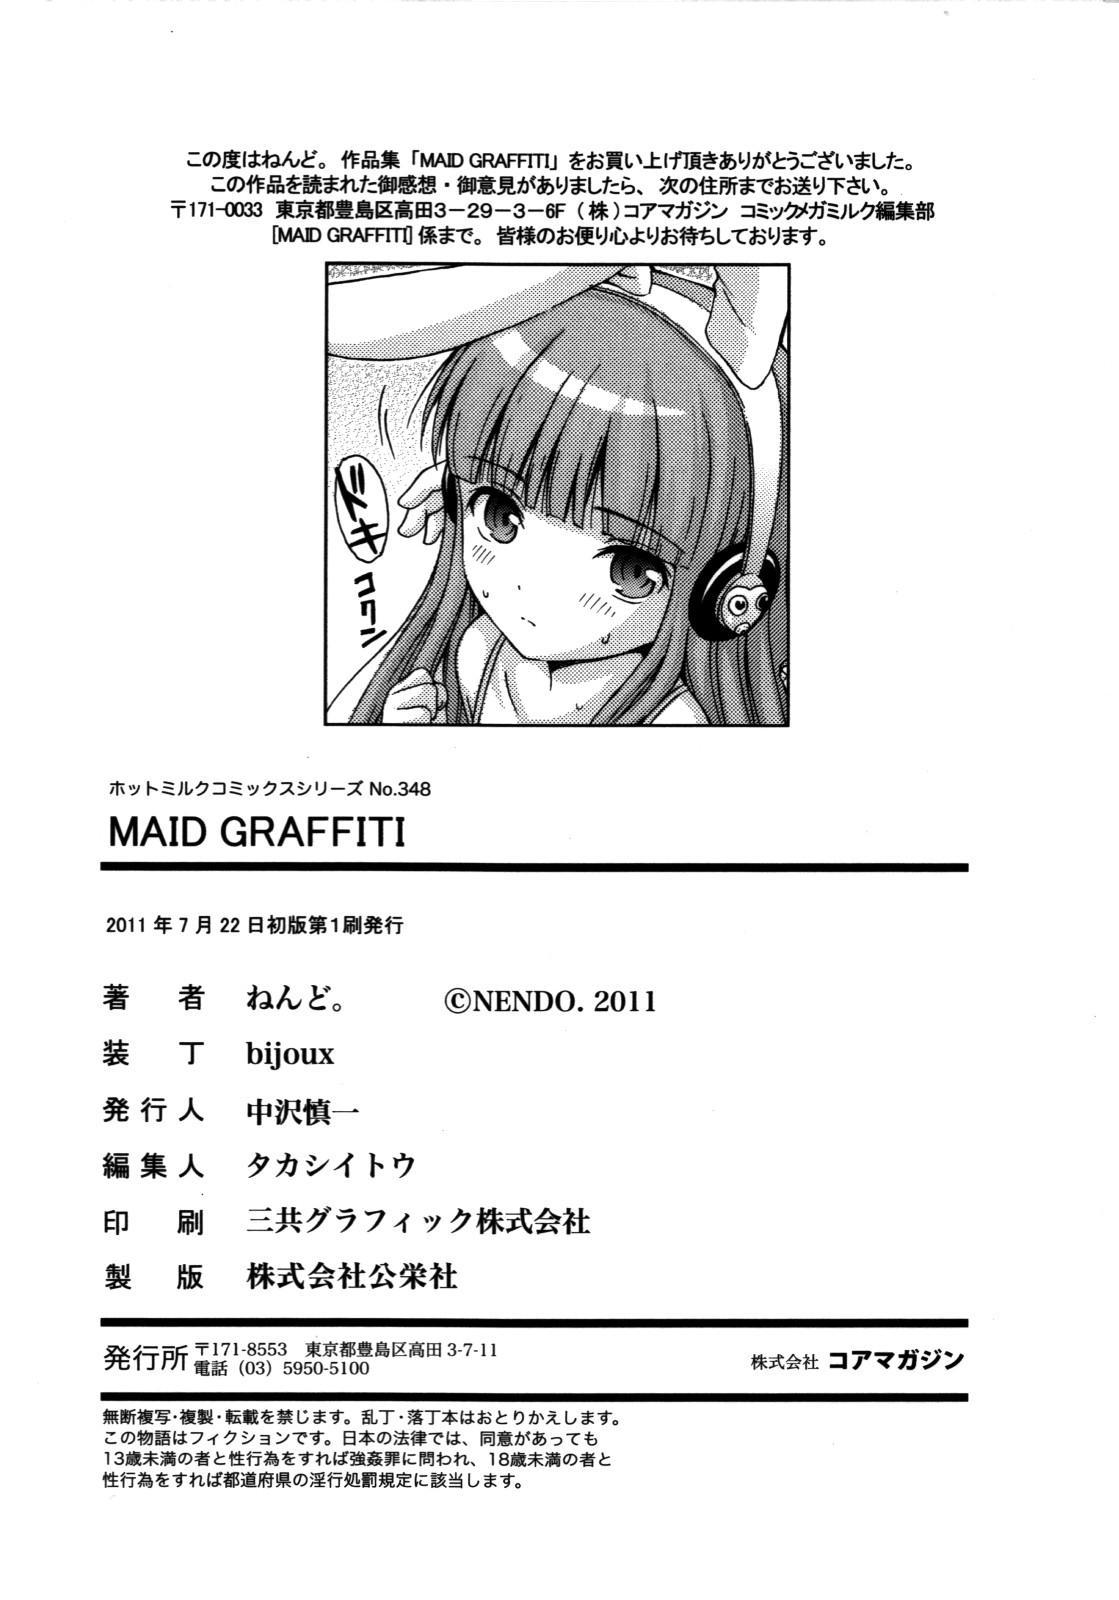 Maid Graffiti 203